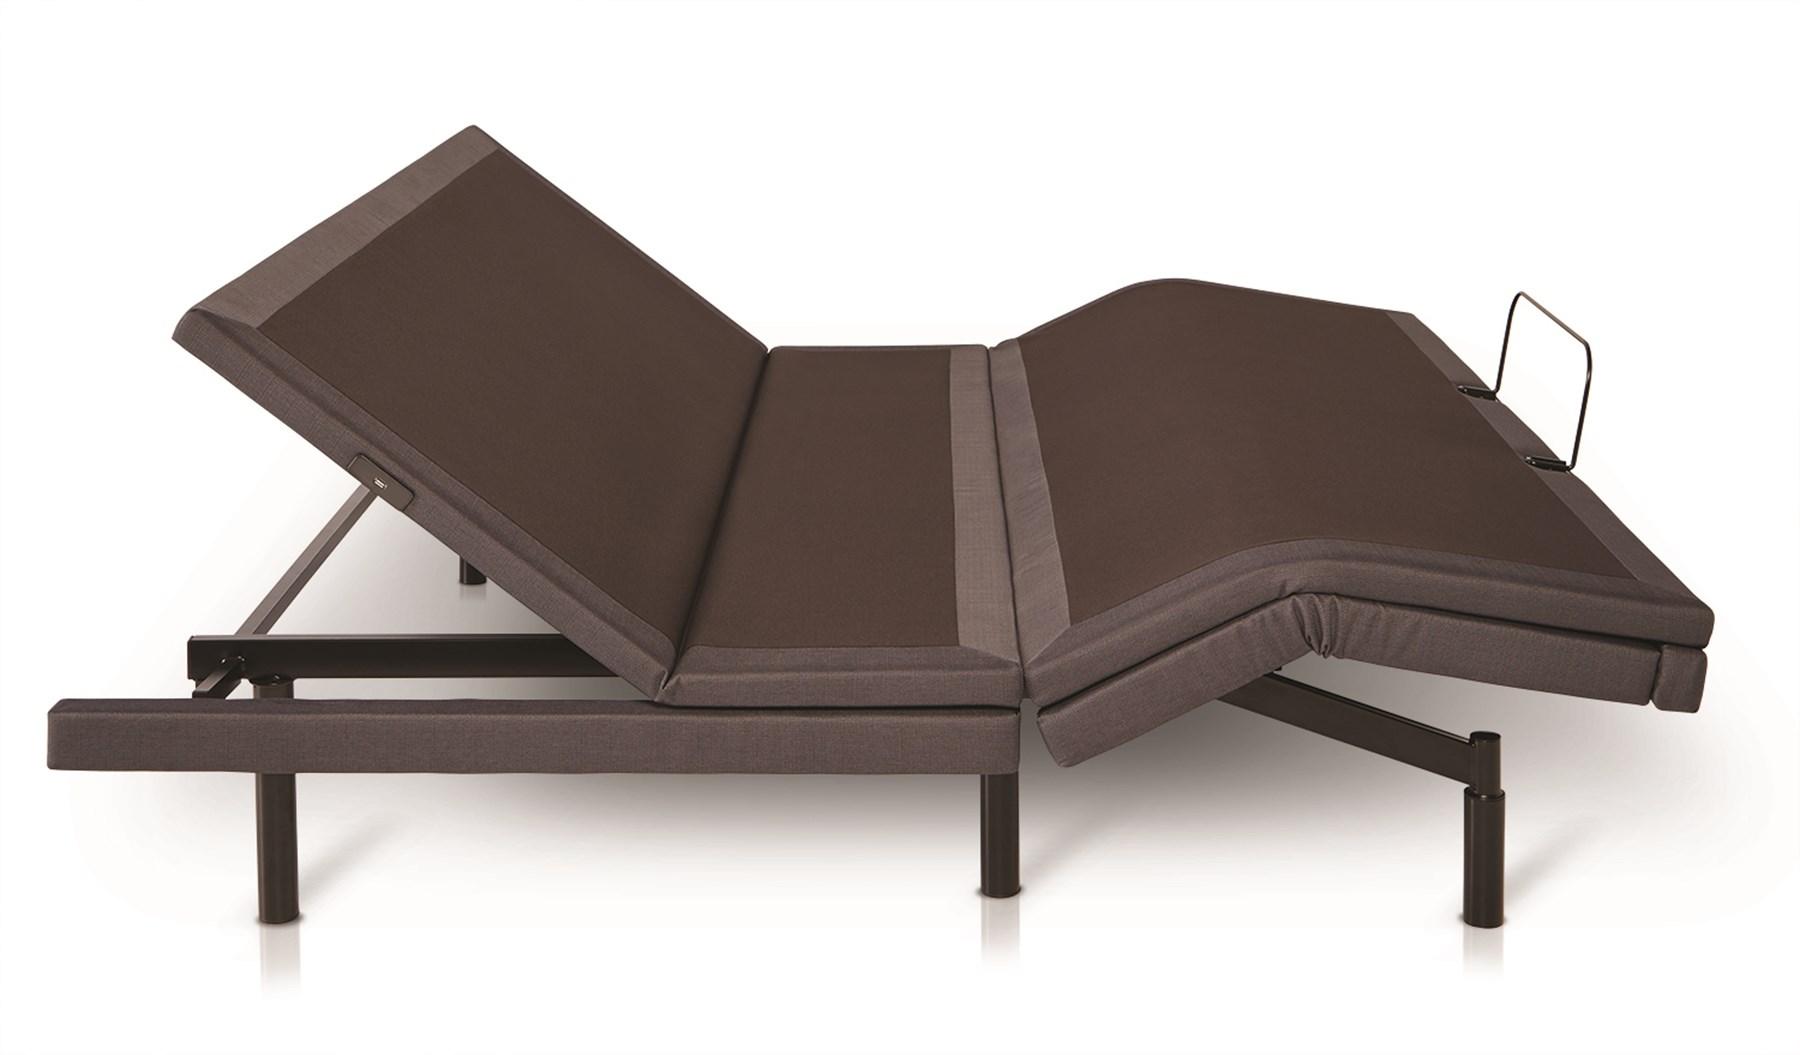 Mantua Rize Verge Royal Bedding